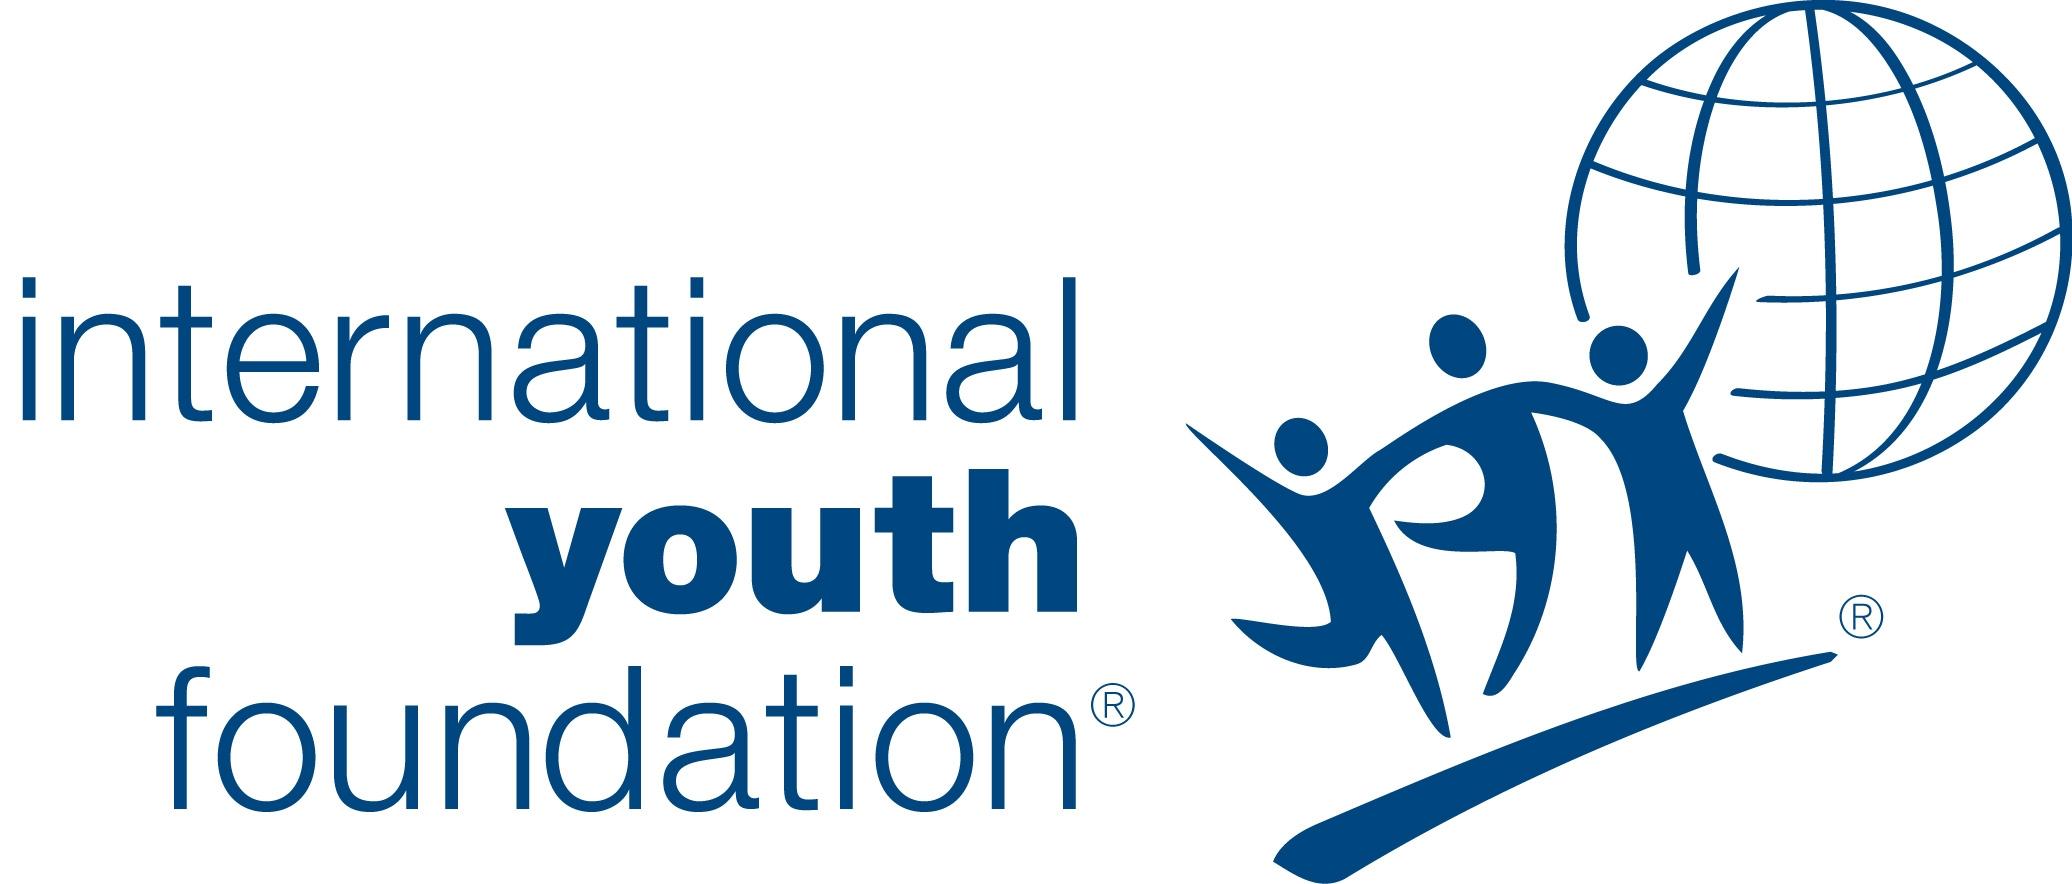 International Youth Foundation logo